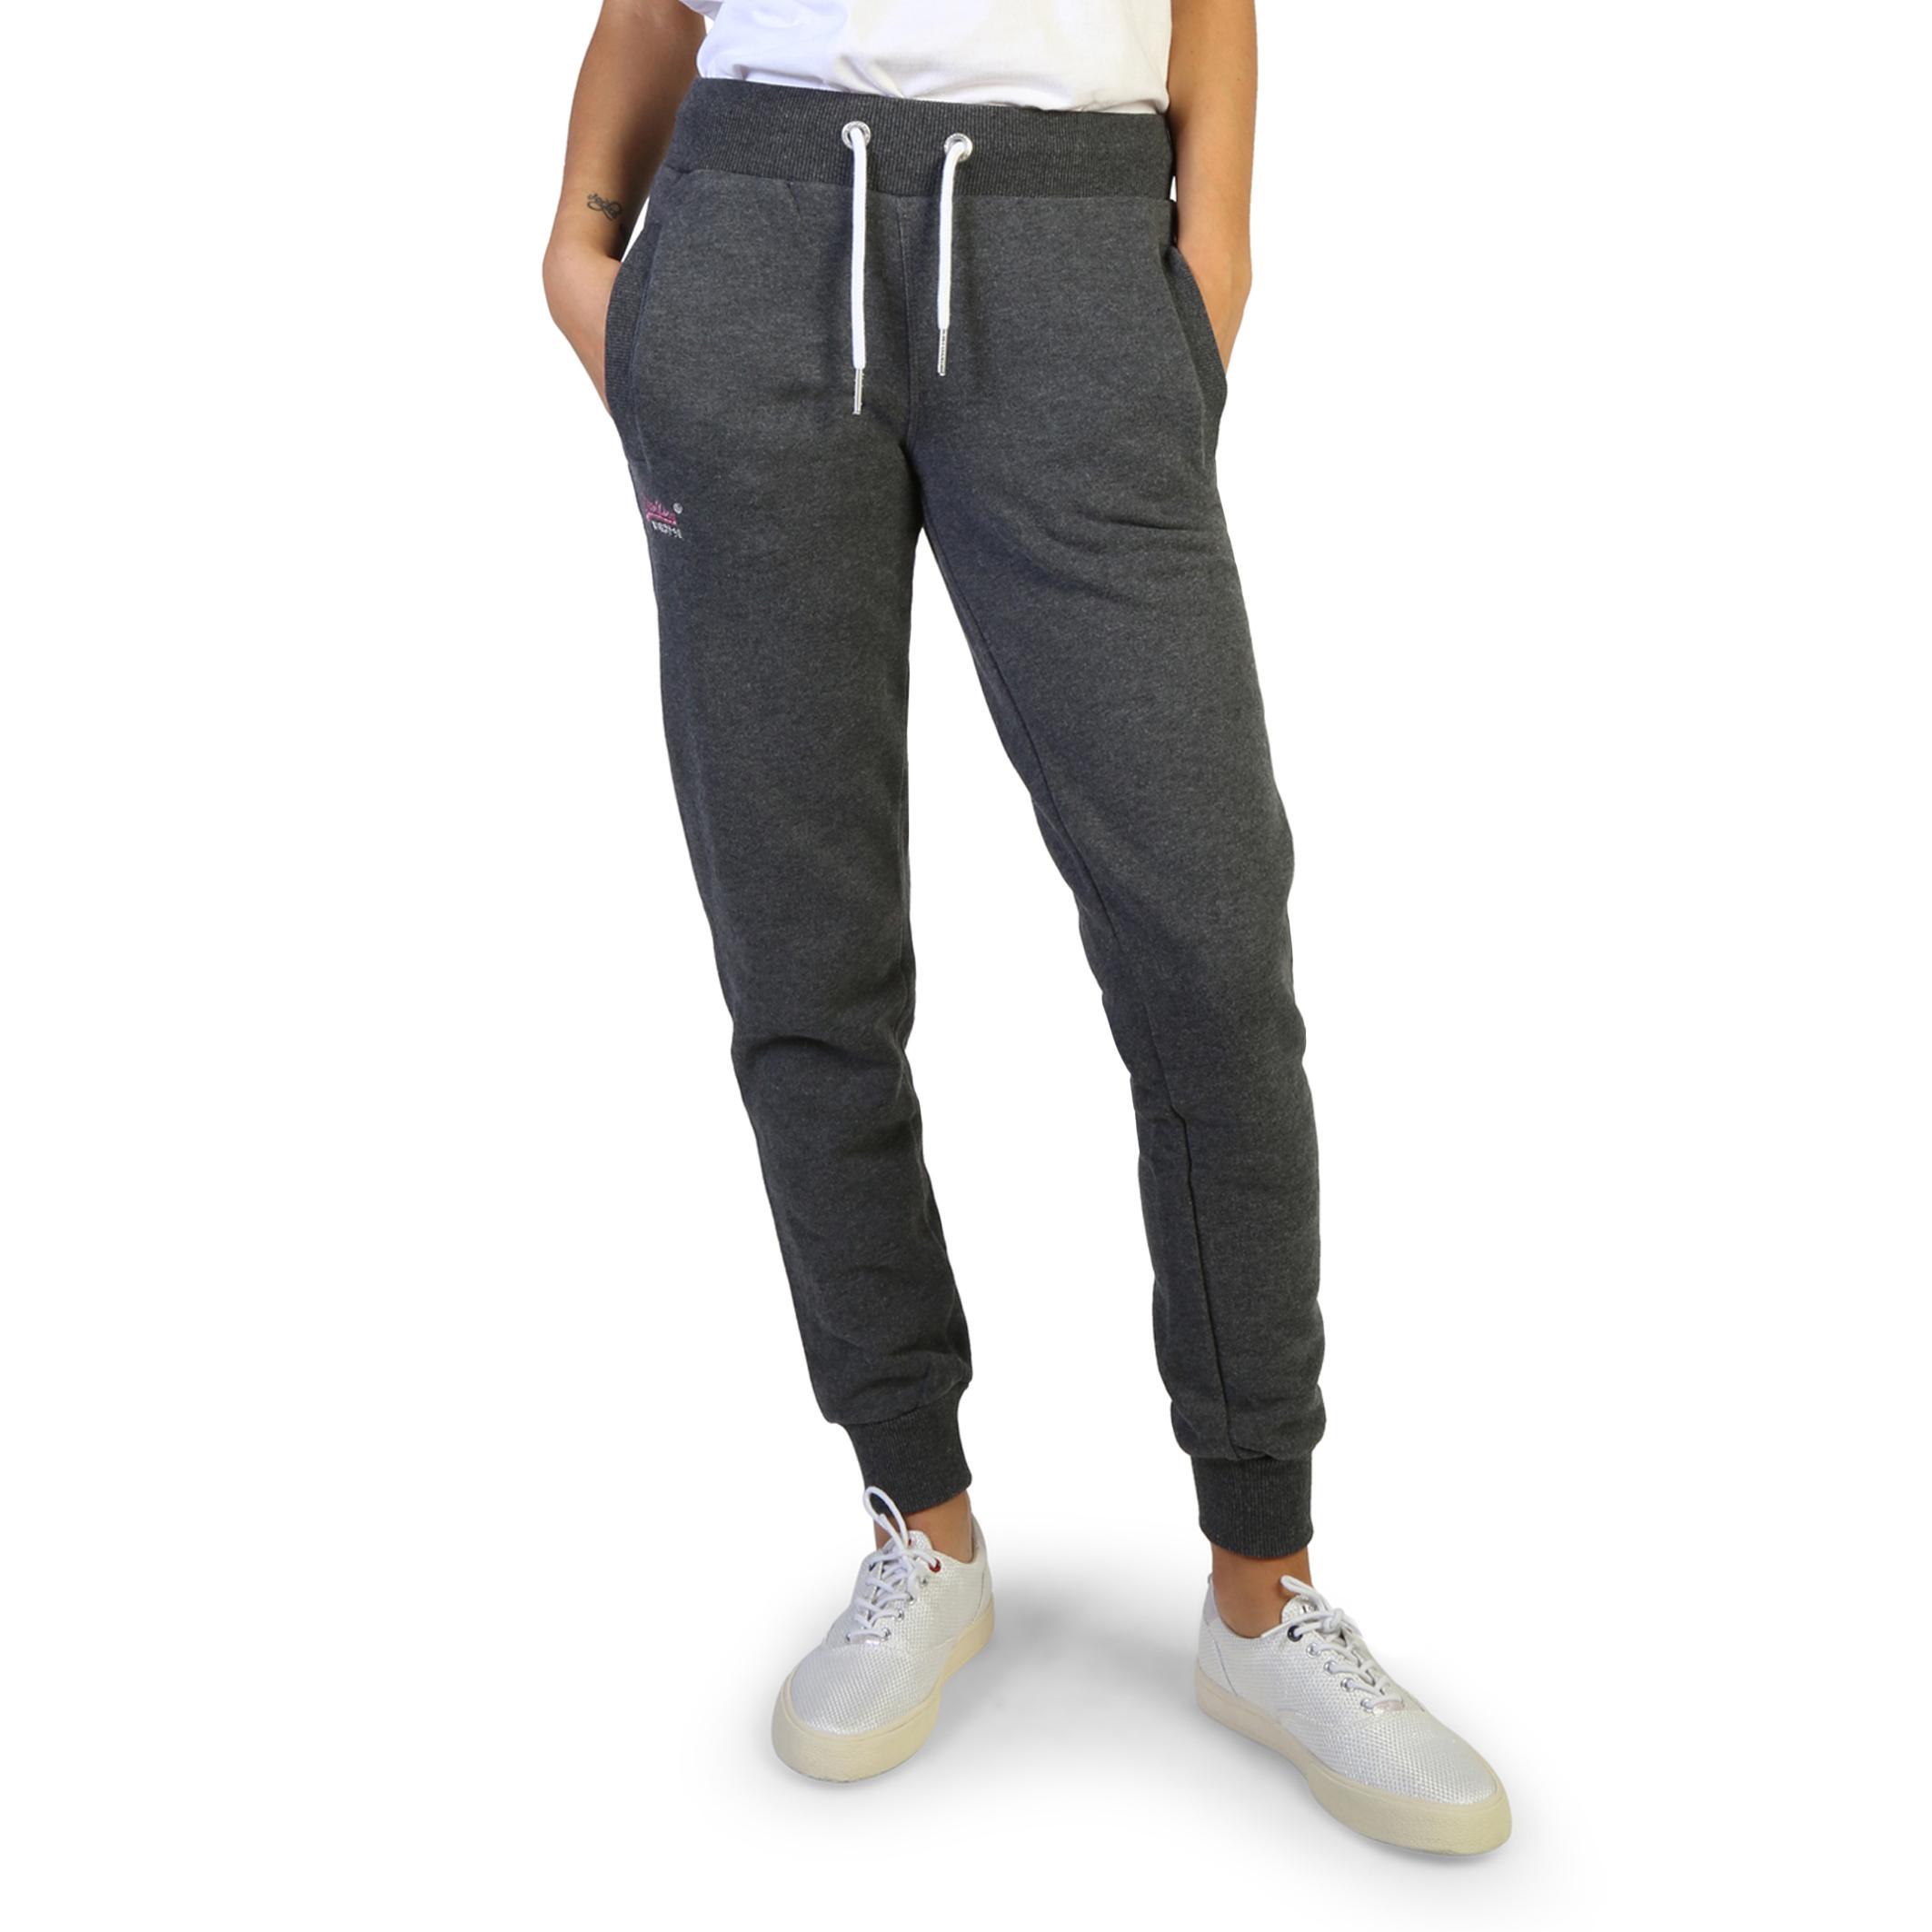 Pantaloni tuta Superdry G70023NS Donna Grigio 103766